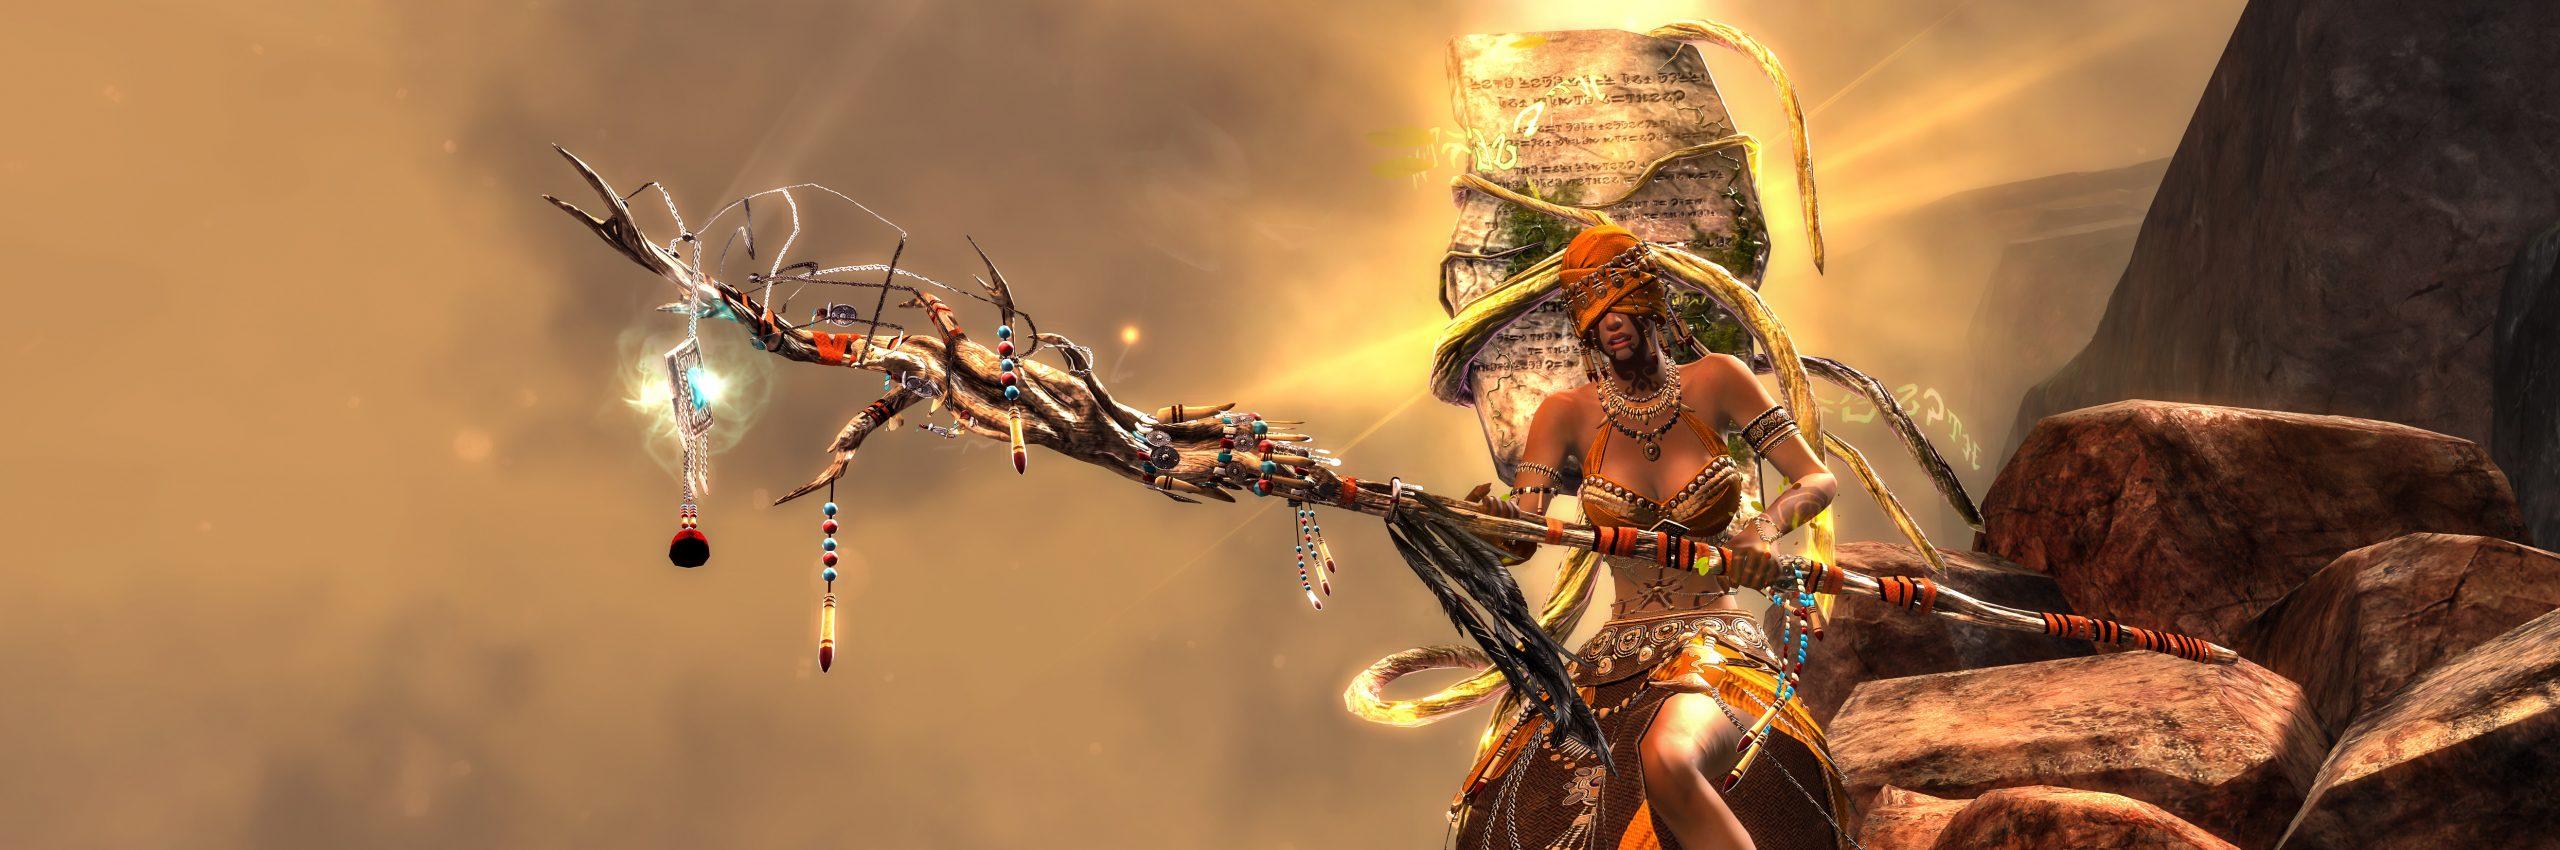 Guild Wars 2 Cantha ritualista